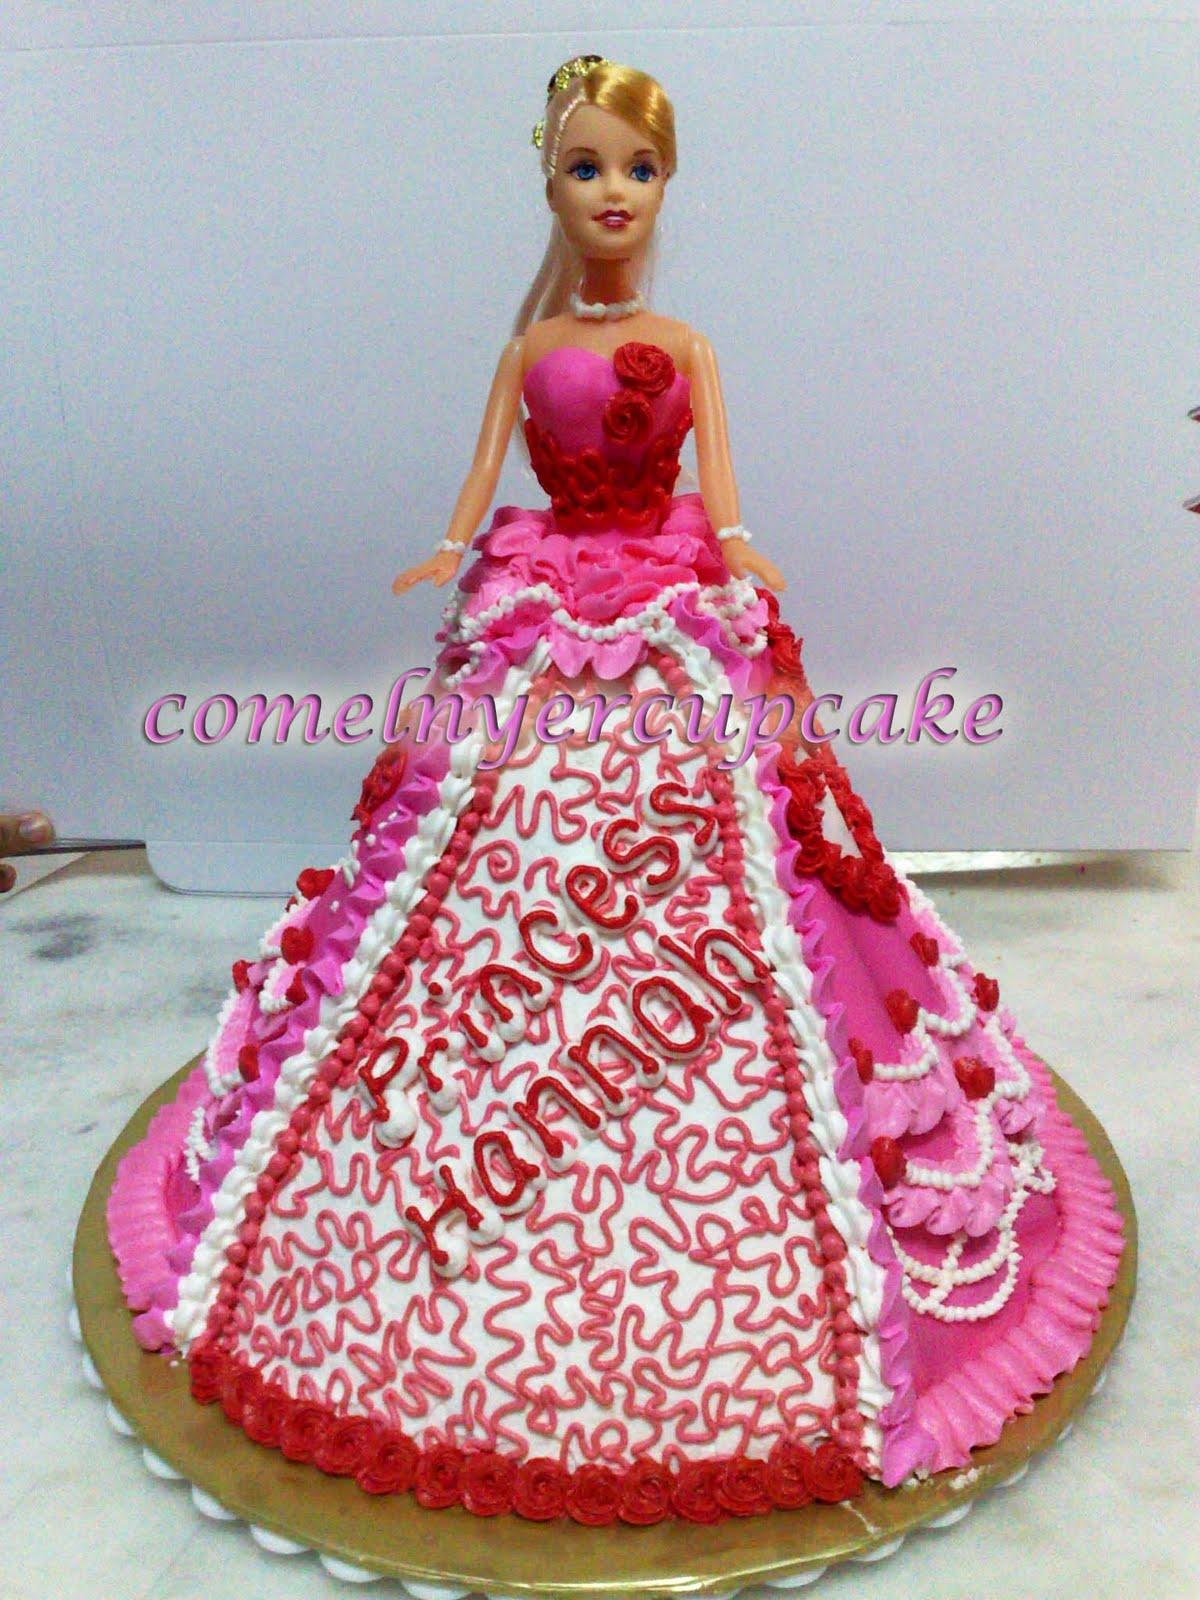 Comelnyercupcake Barbie Doll Cakes Princess Hannah